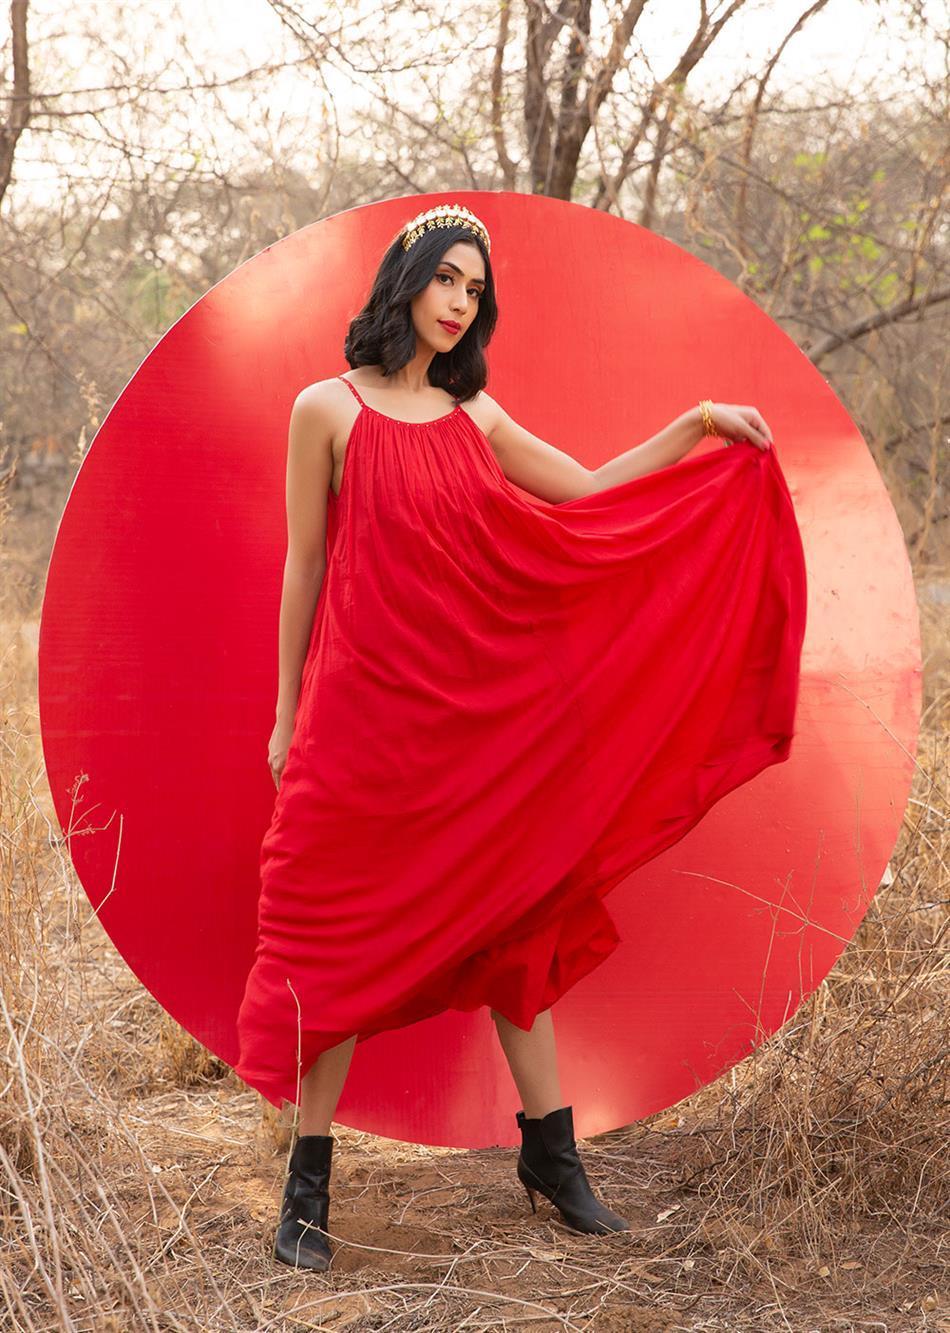 THE CHERRY DRESS  By Jovi Fashion